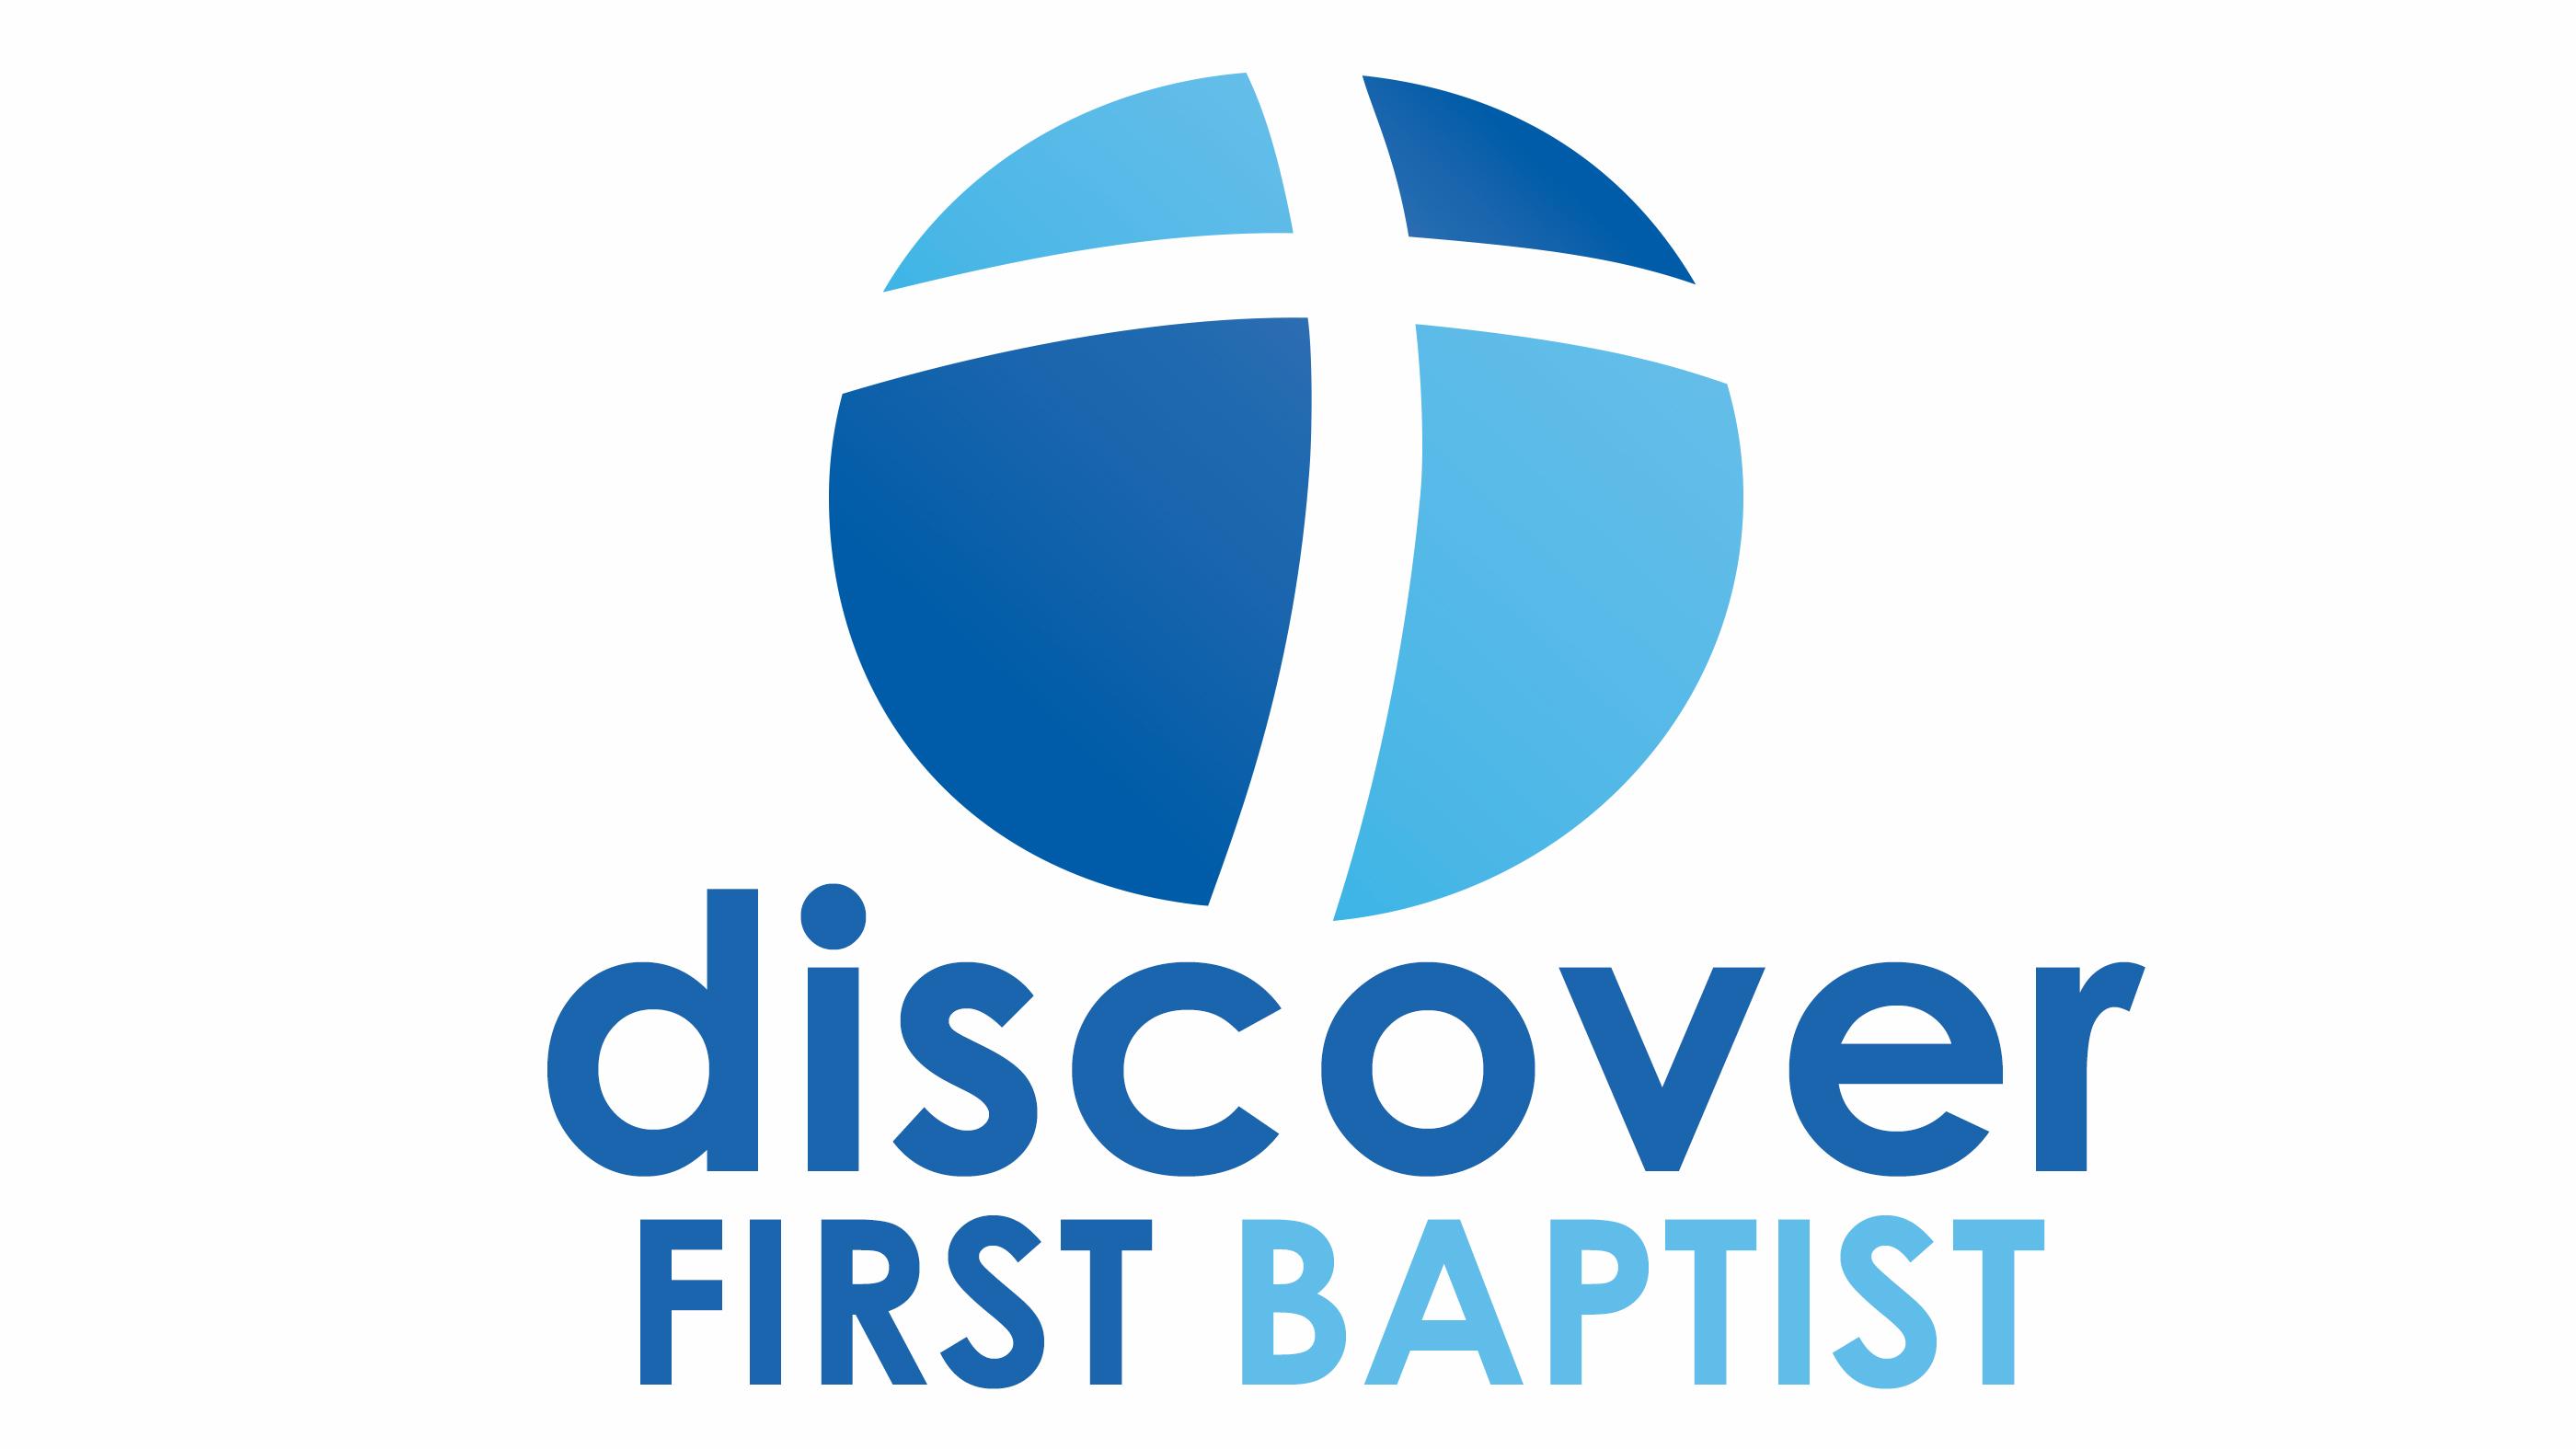 Discover fbc